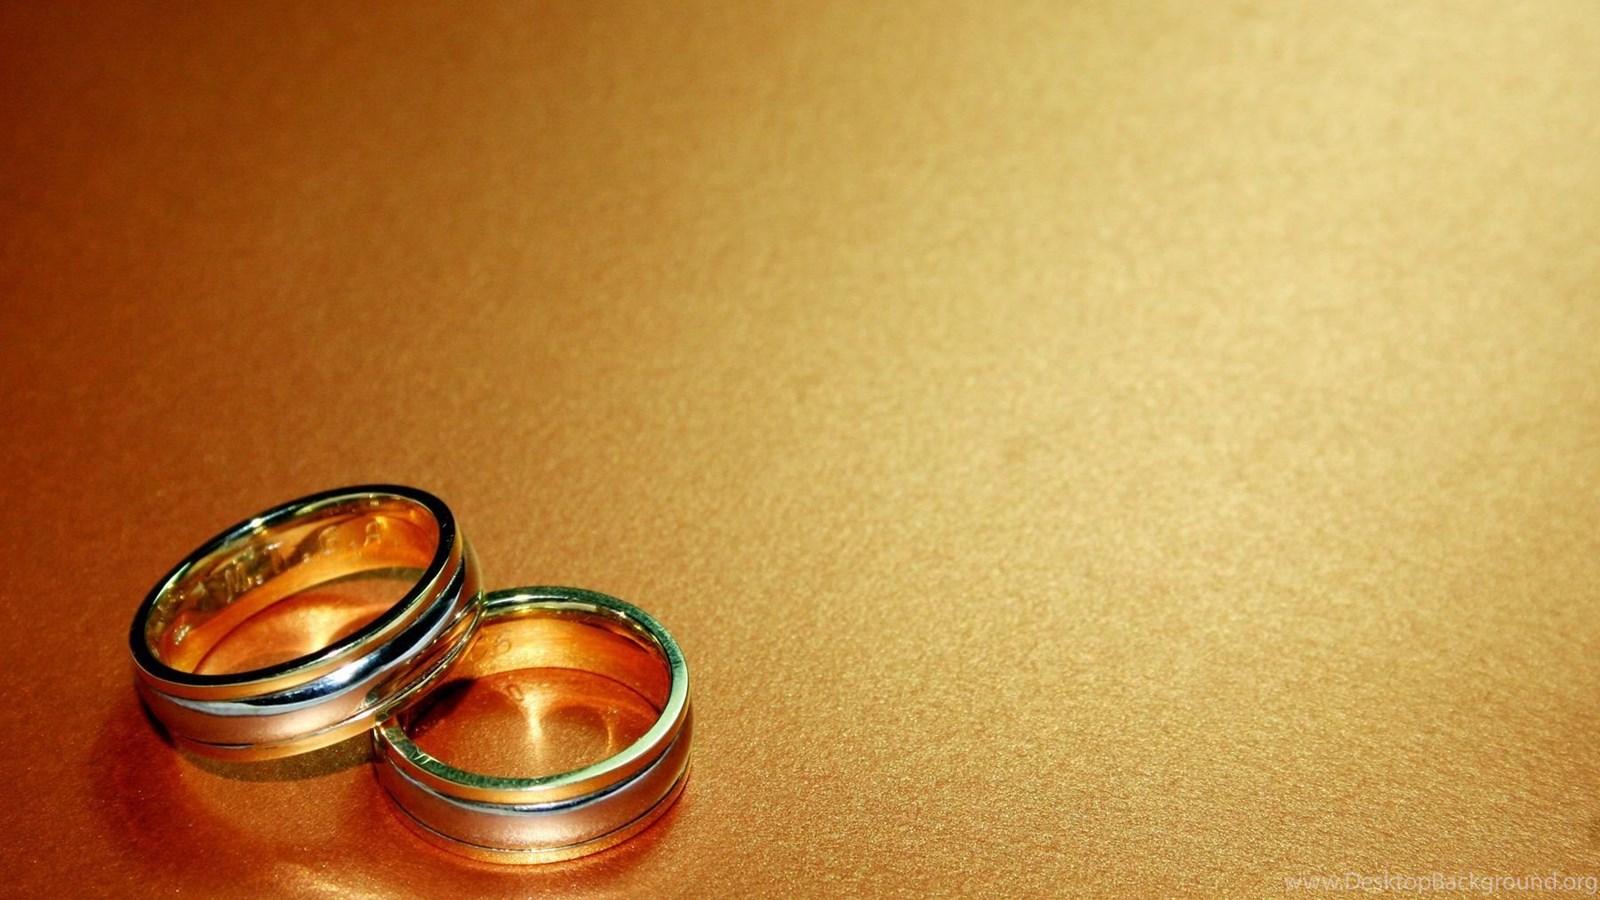 Playstation Wedding Ring